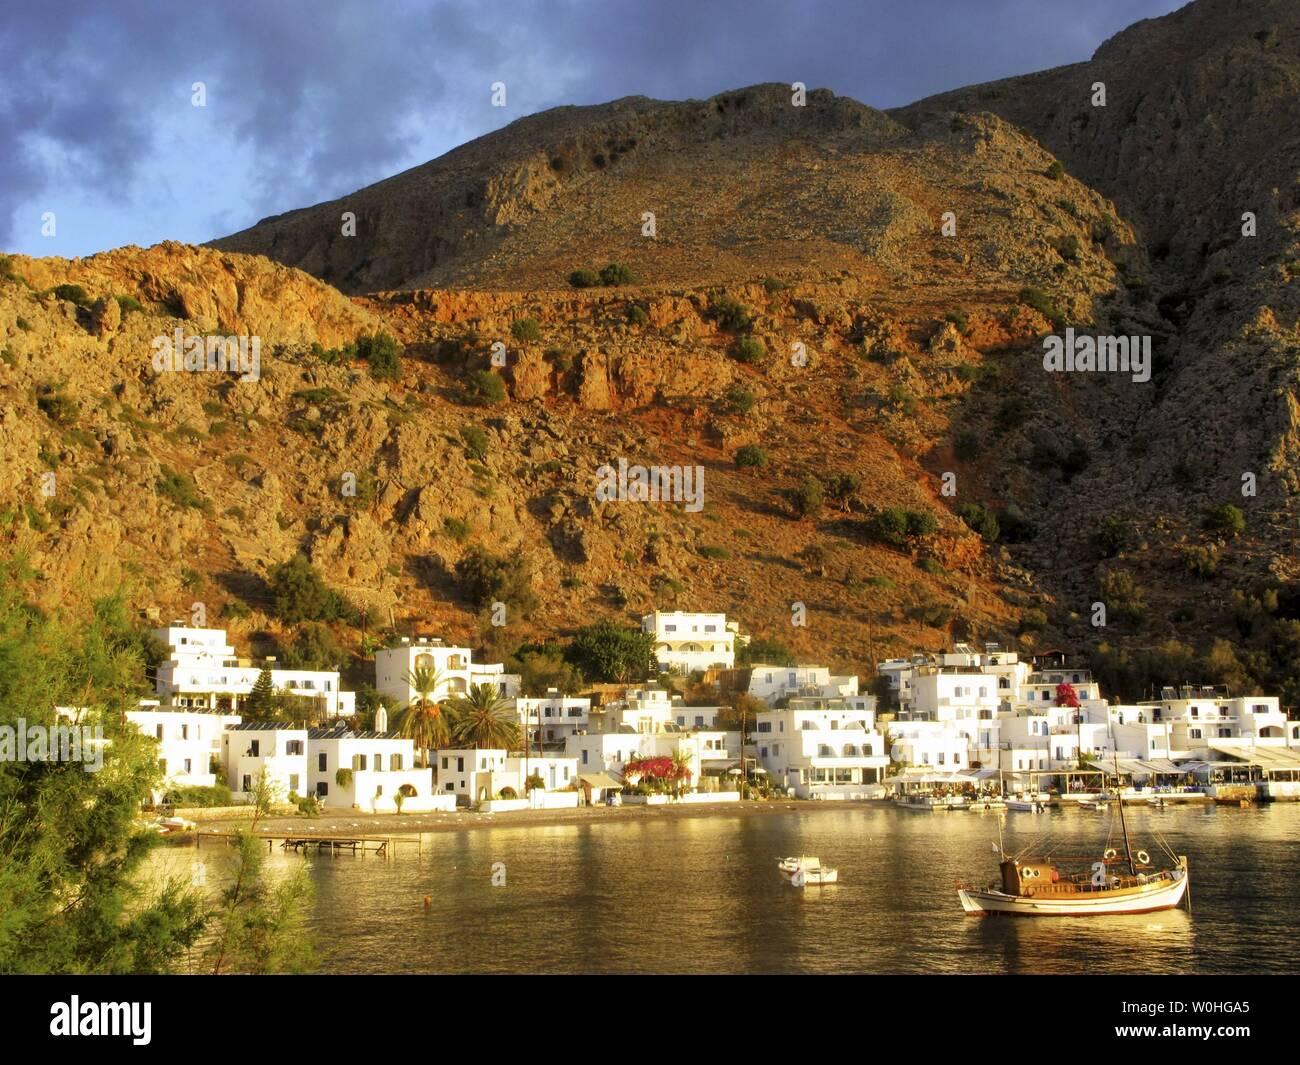 Early morning light, Loutro, South Crete, Greece Stock Photo